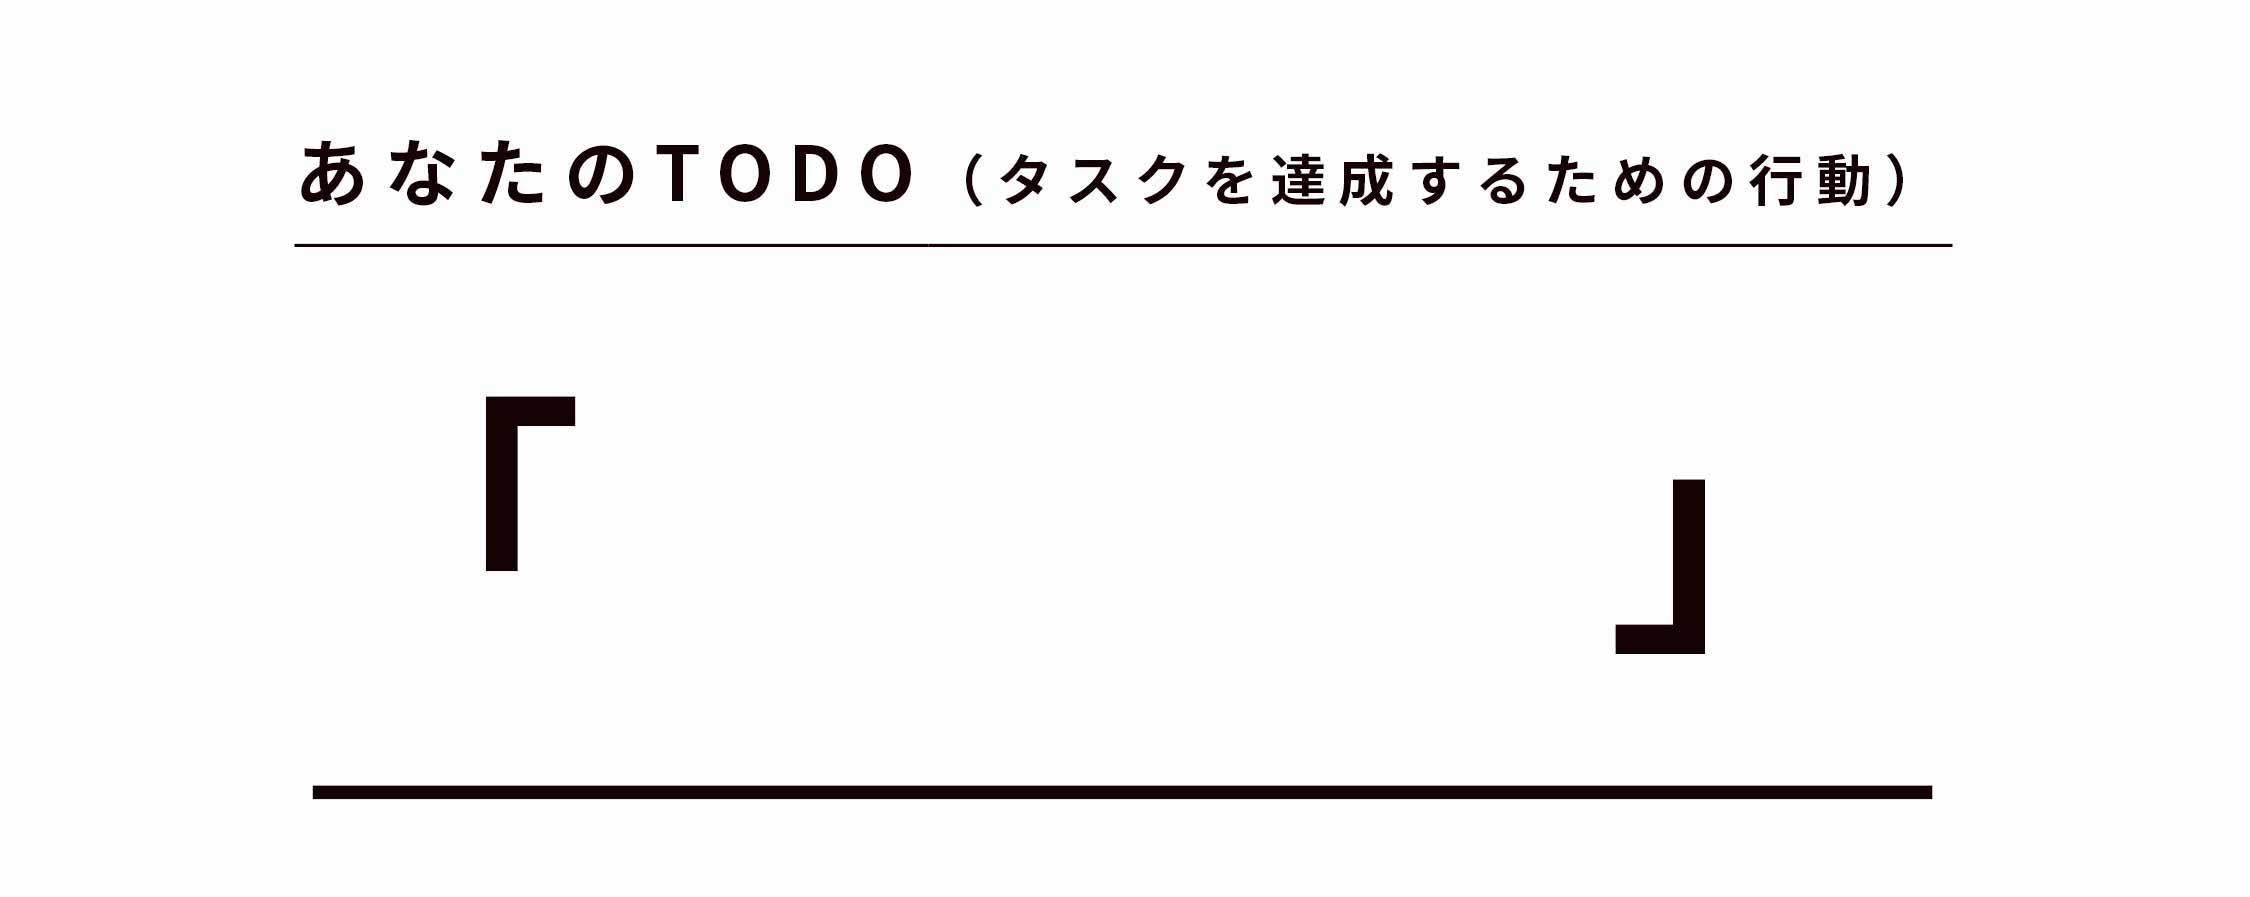 TODO 空白 画像